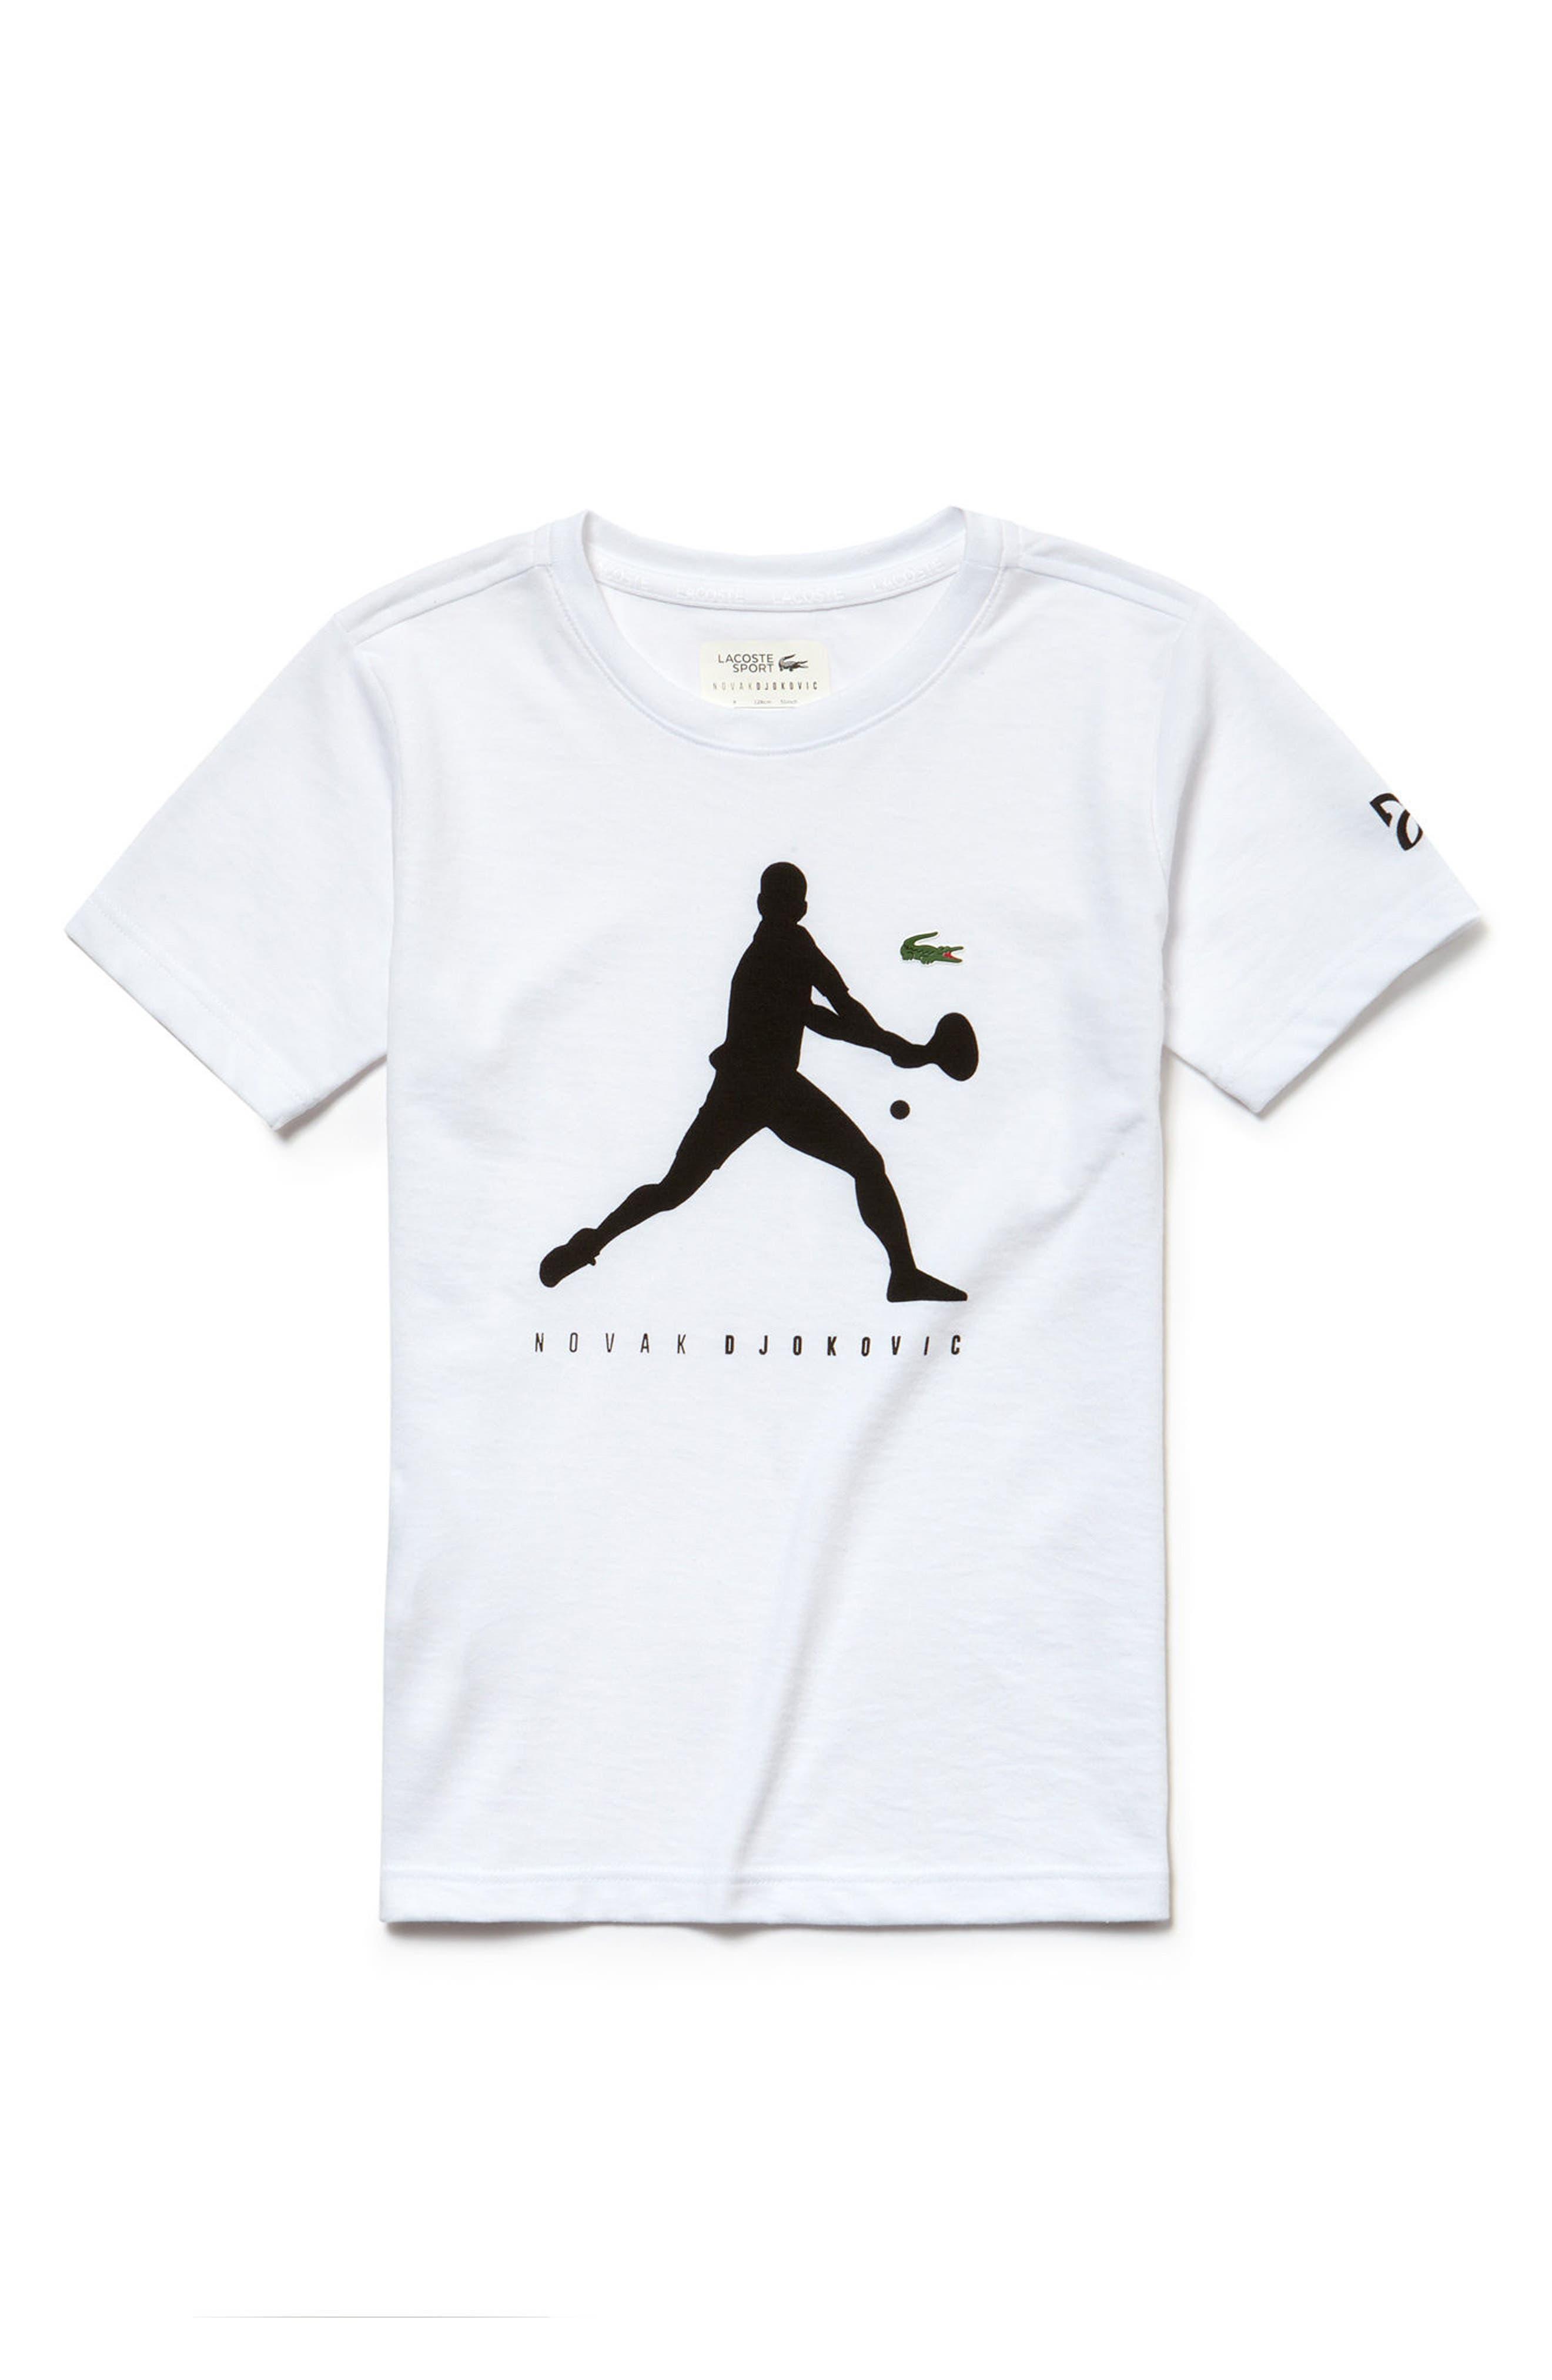 Tech Jersey T-Shirt,                             Main thumbnail 1, color,                             White/ Black